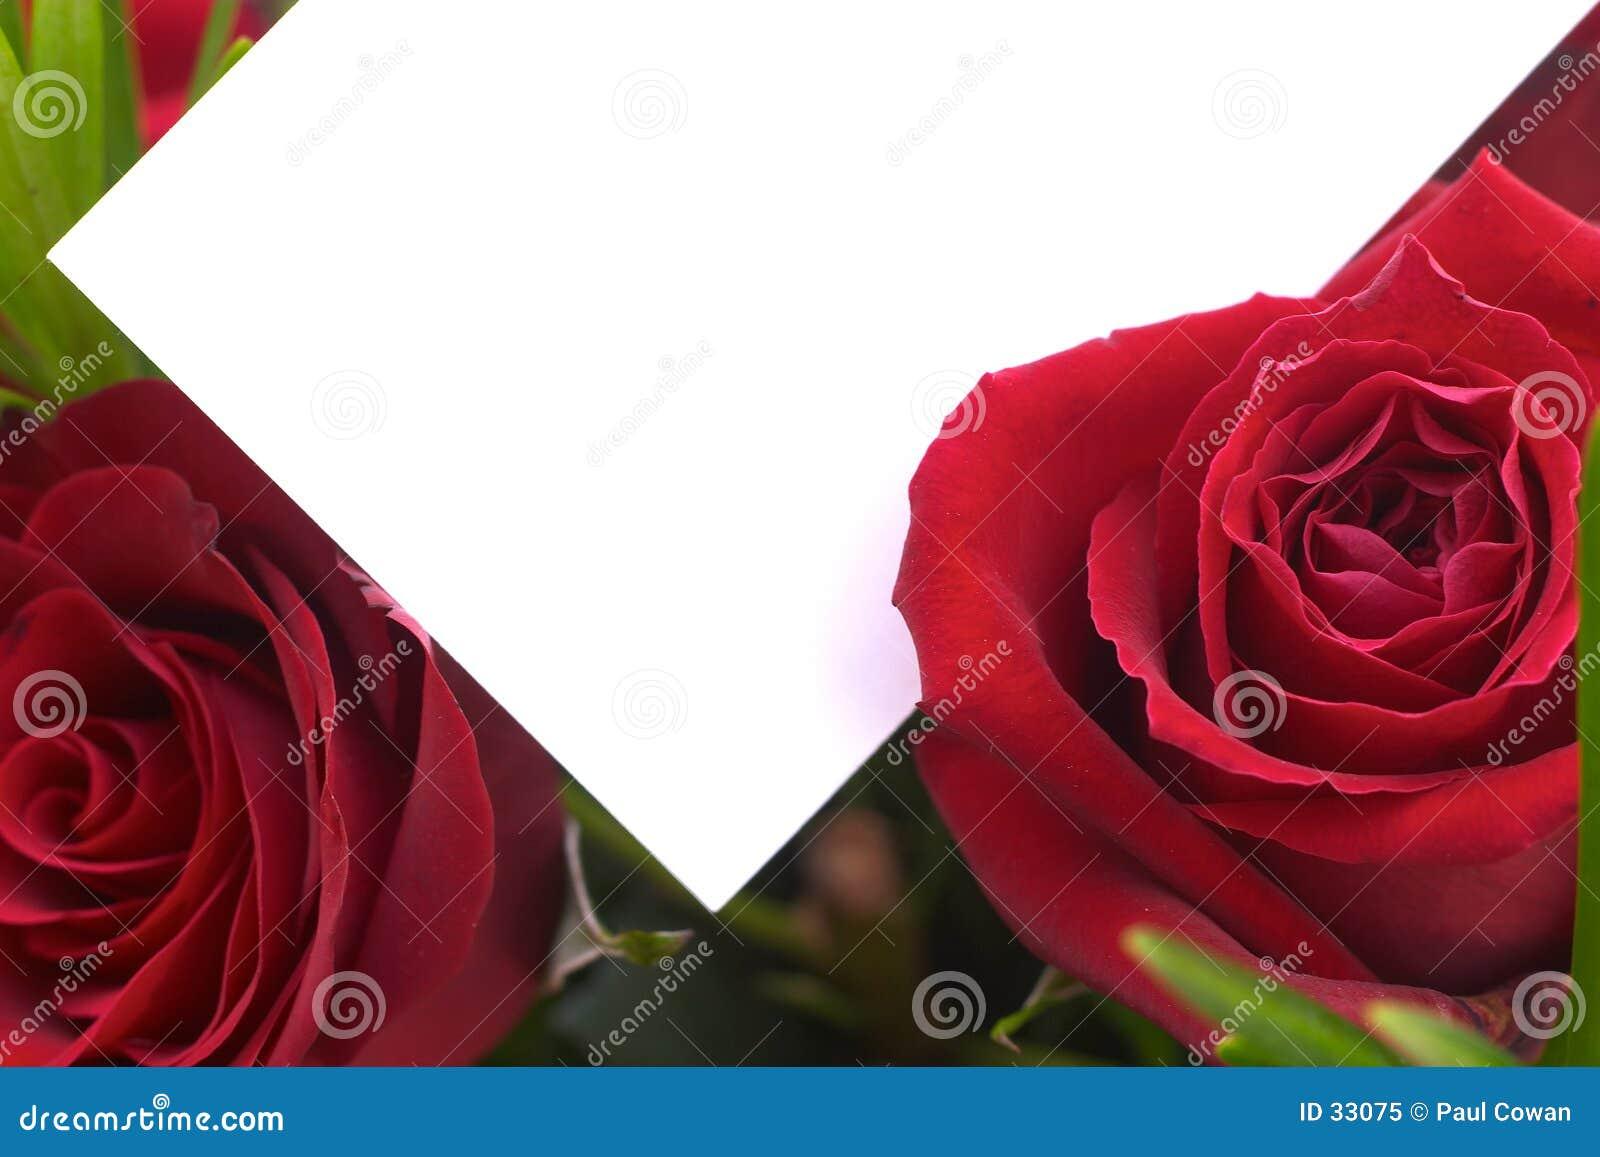 Download Rosas rojas 2 imagen de archivo. Imagen de florist, amor - 33075